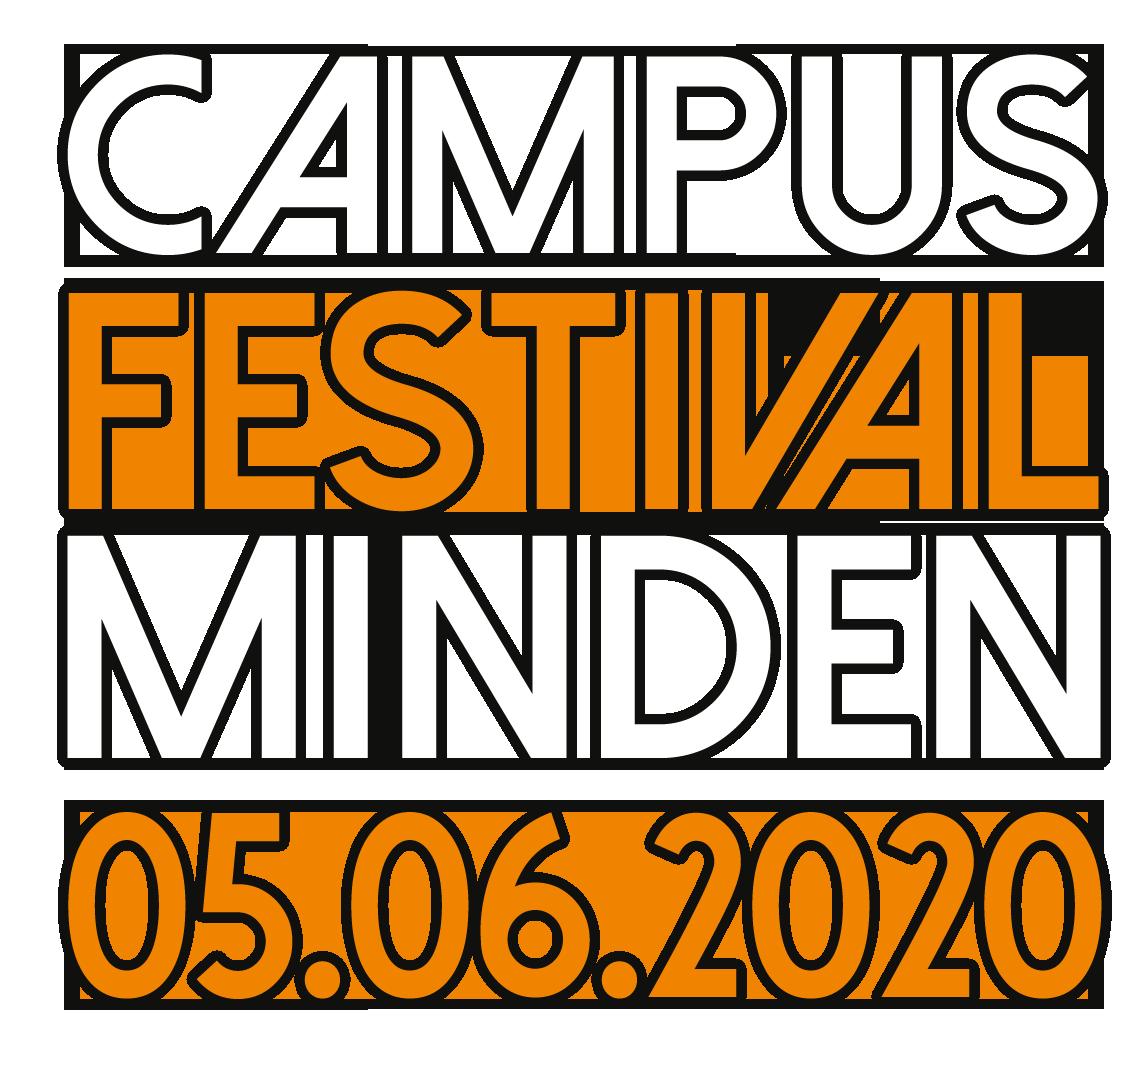 Campus Festival Minden